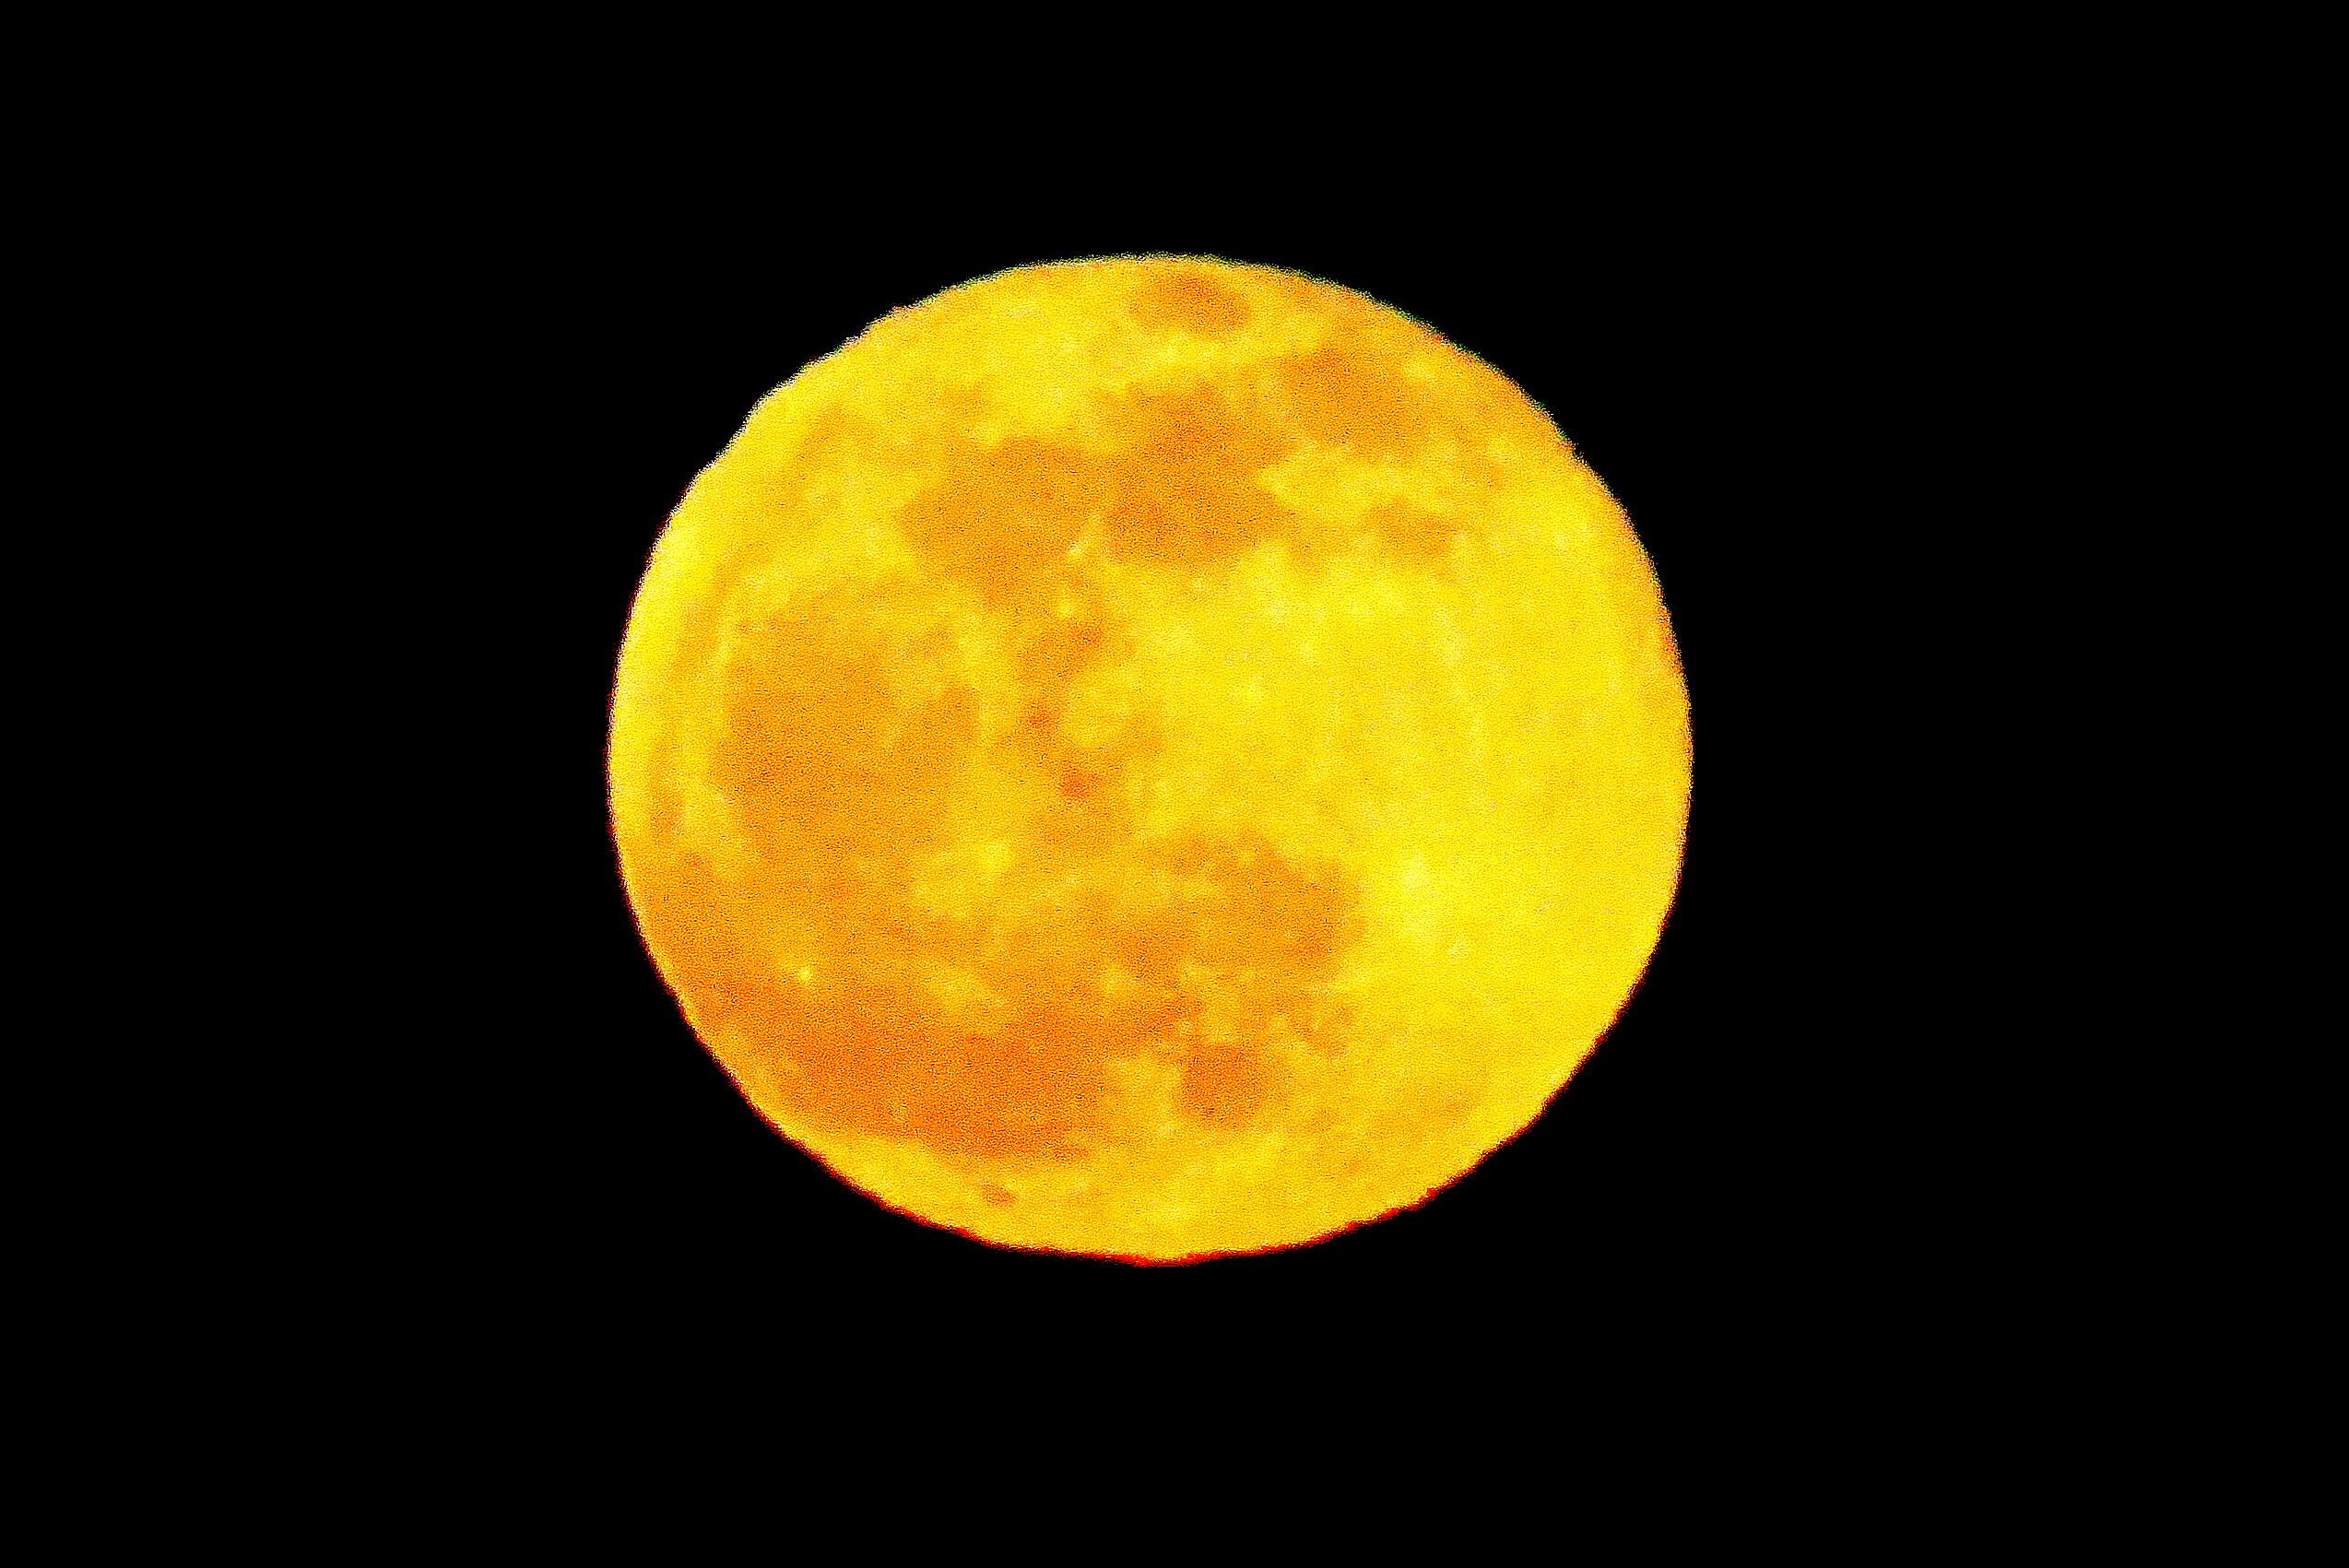 Zodiac et pleine lune